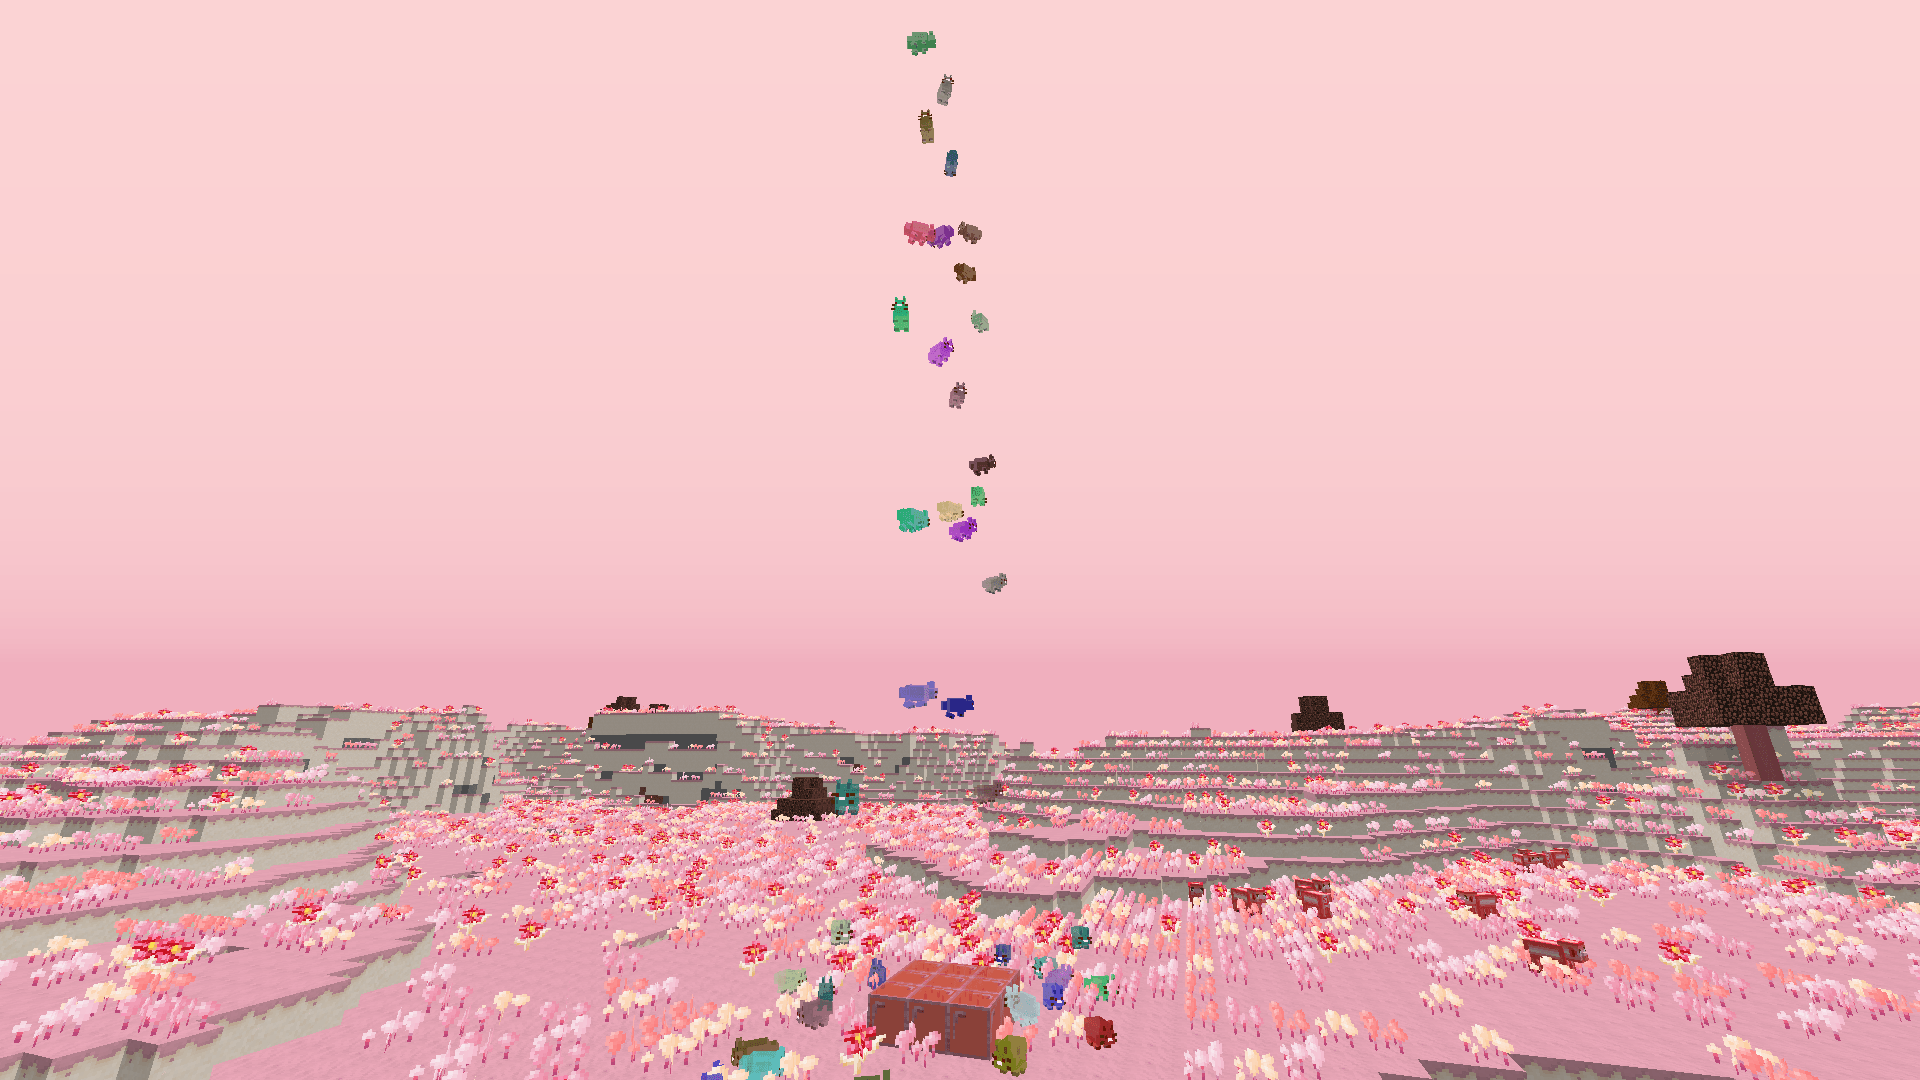 2015-02-23_00.38.43